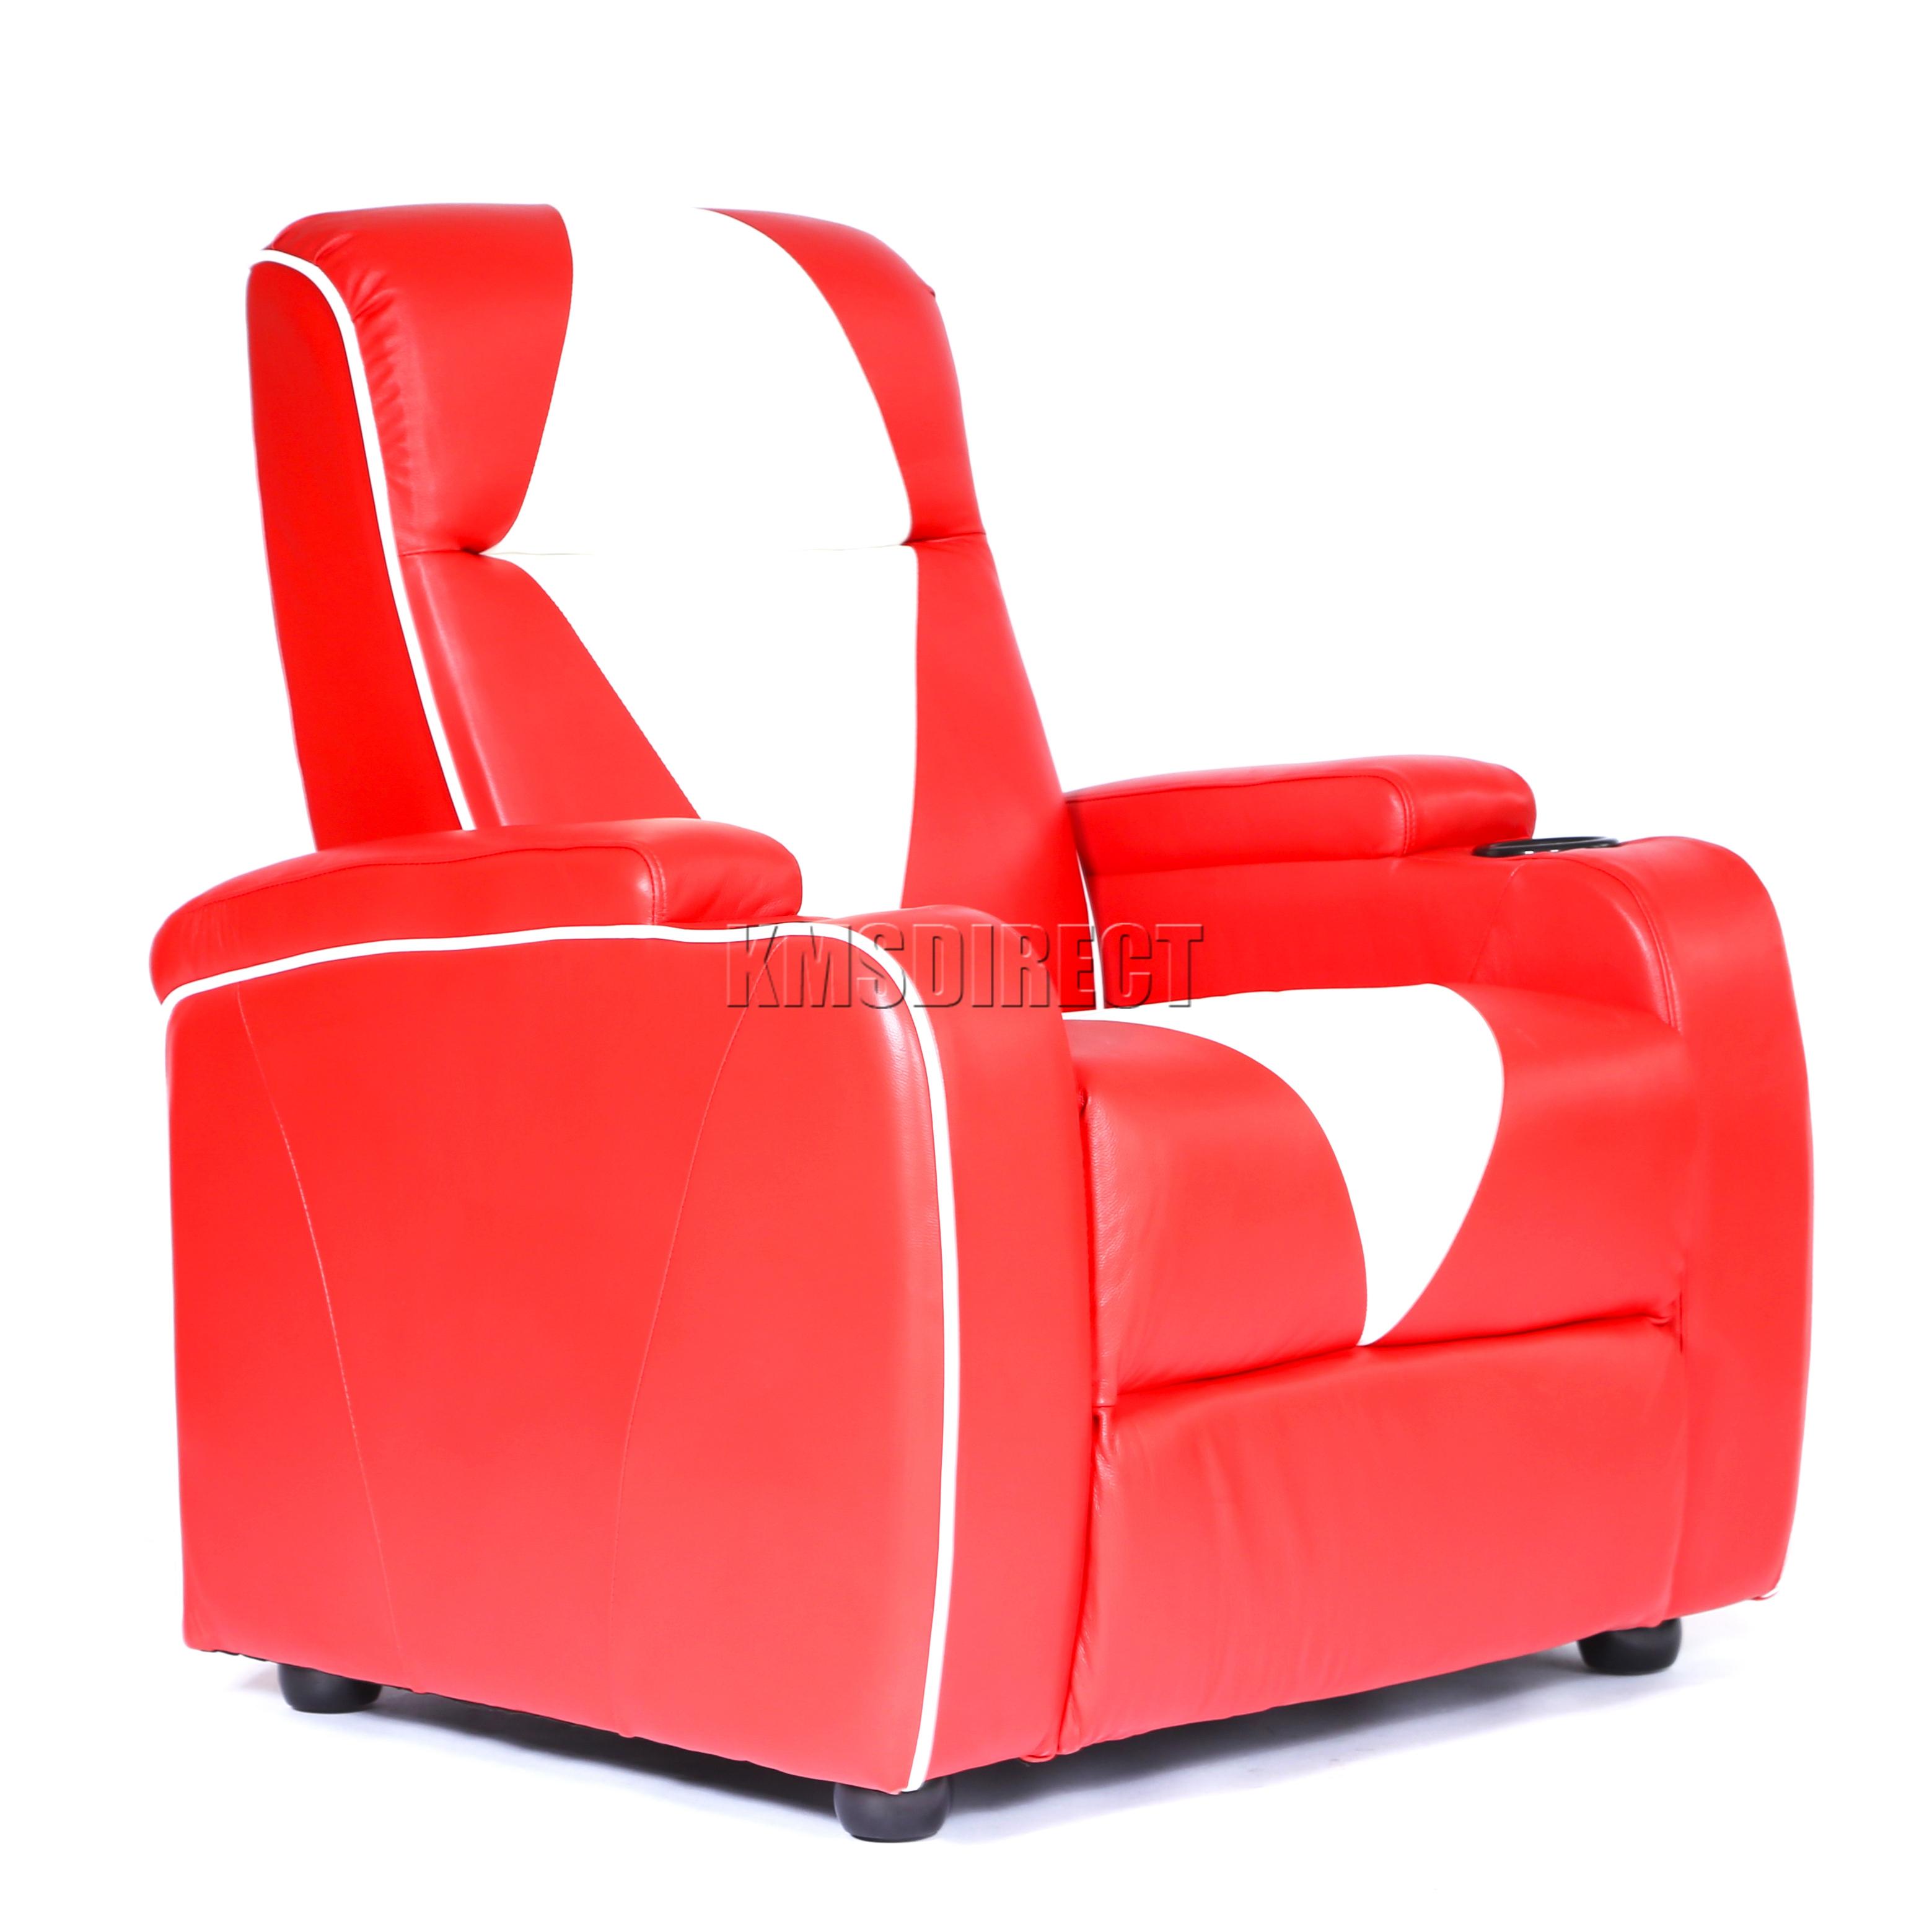 retro white chair flexible folding foxhunter leather theatre cinema movie sofa